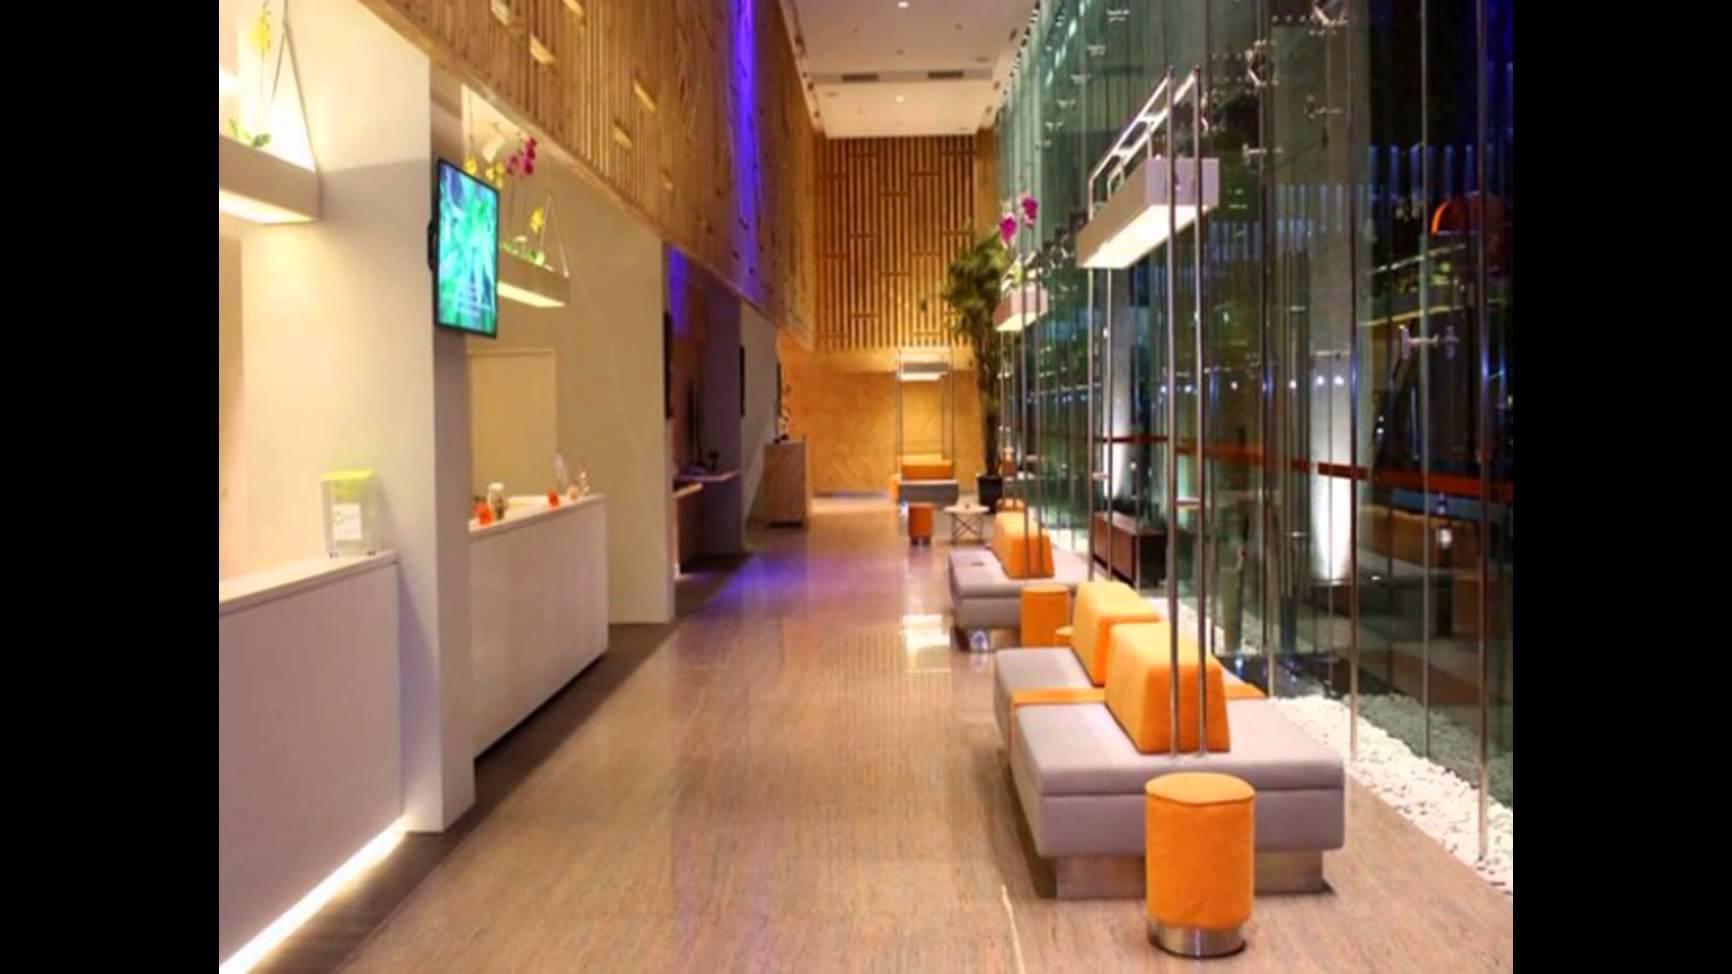 Hotel Dekat Stasiun Kediri Youtube Alun Kab